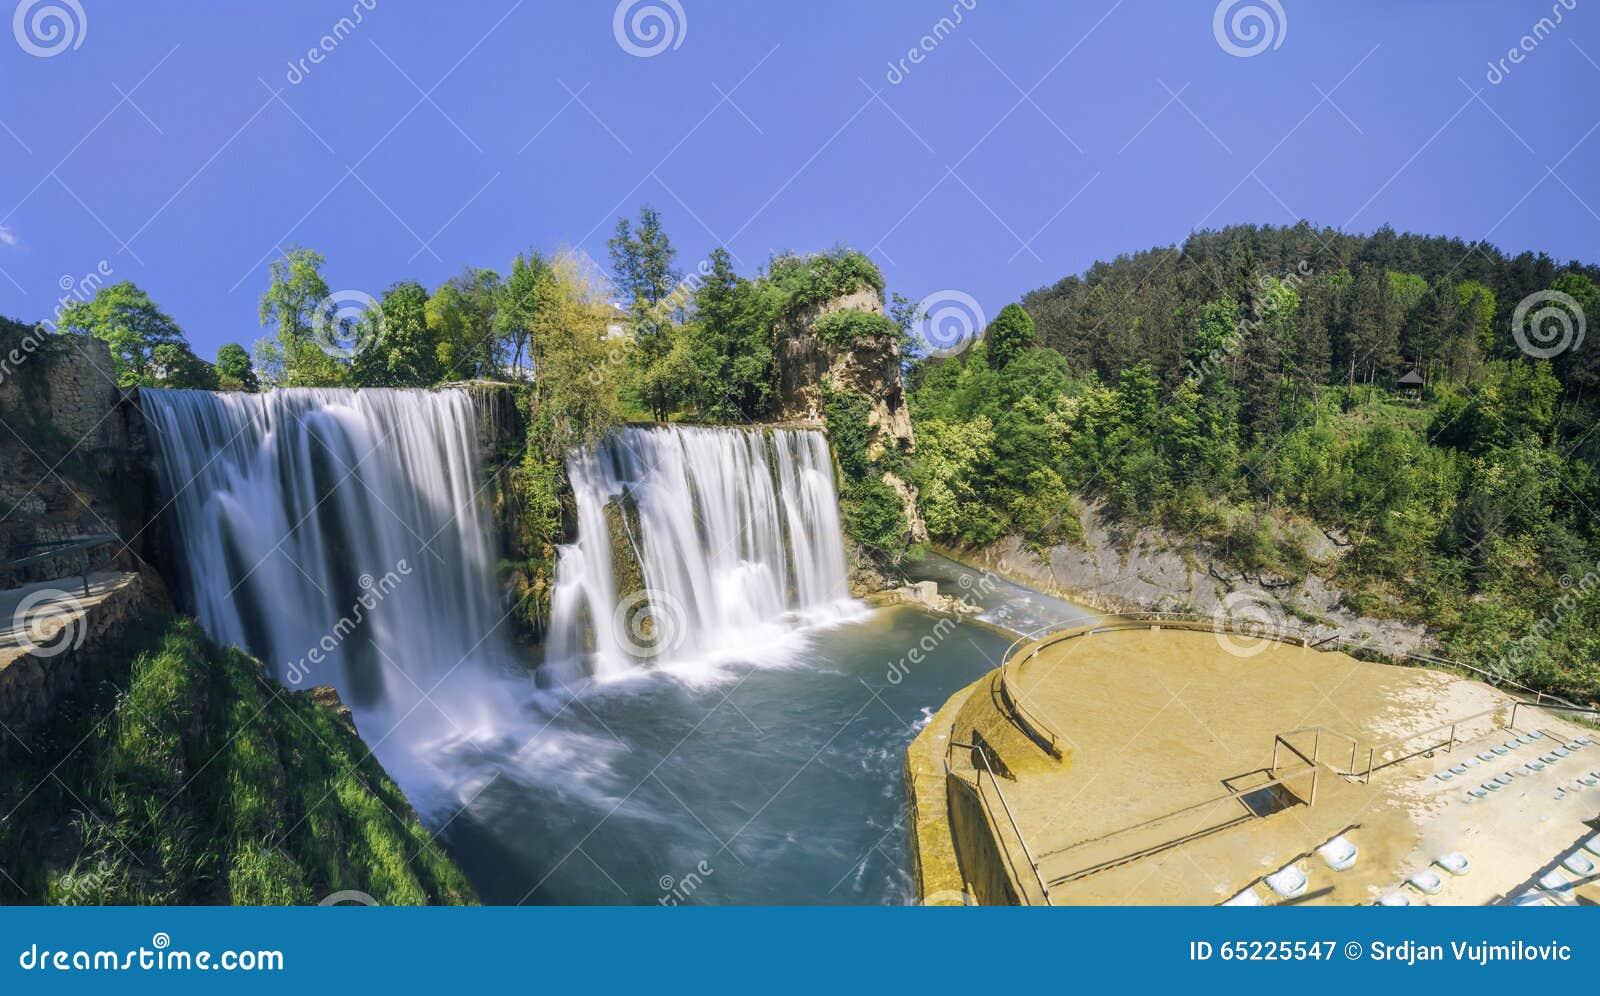 Cascades dans la ville Jajce, Bosnie-Herzégovine